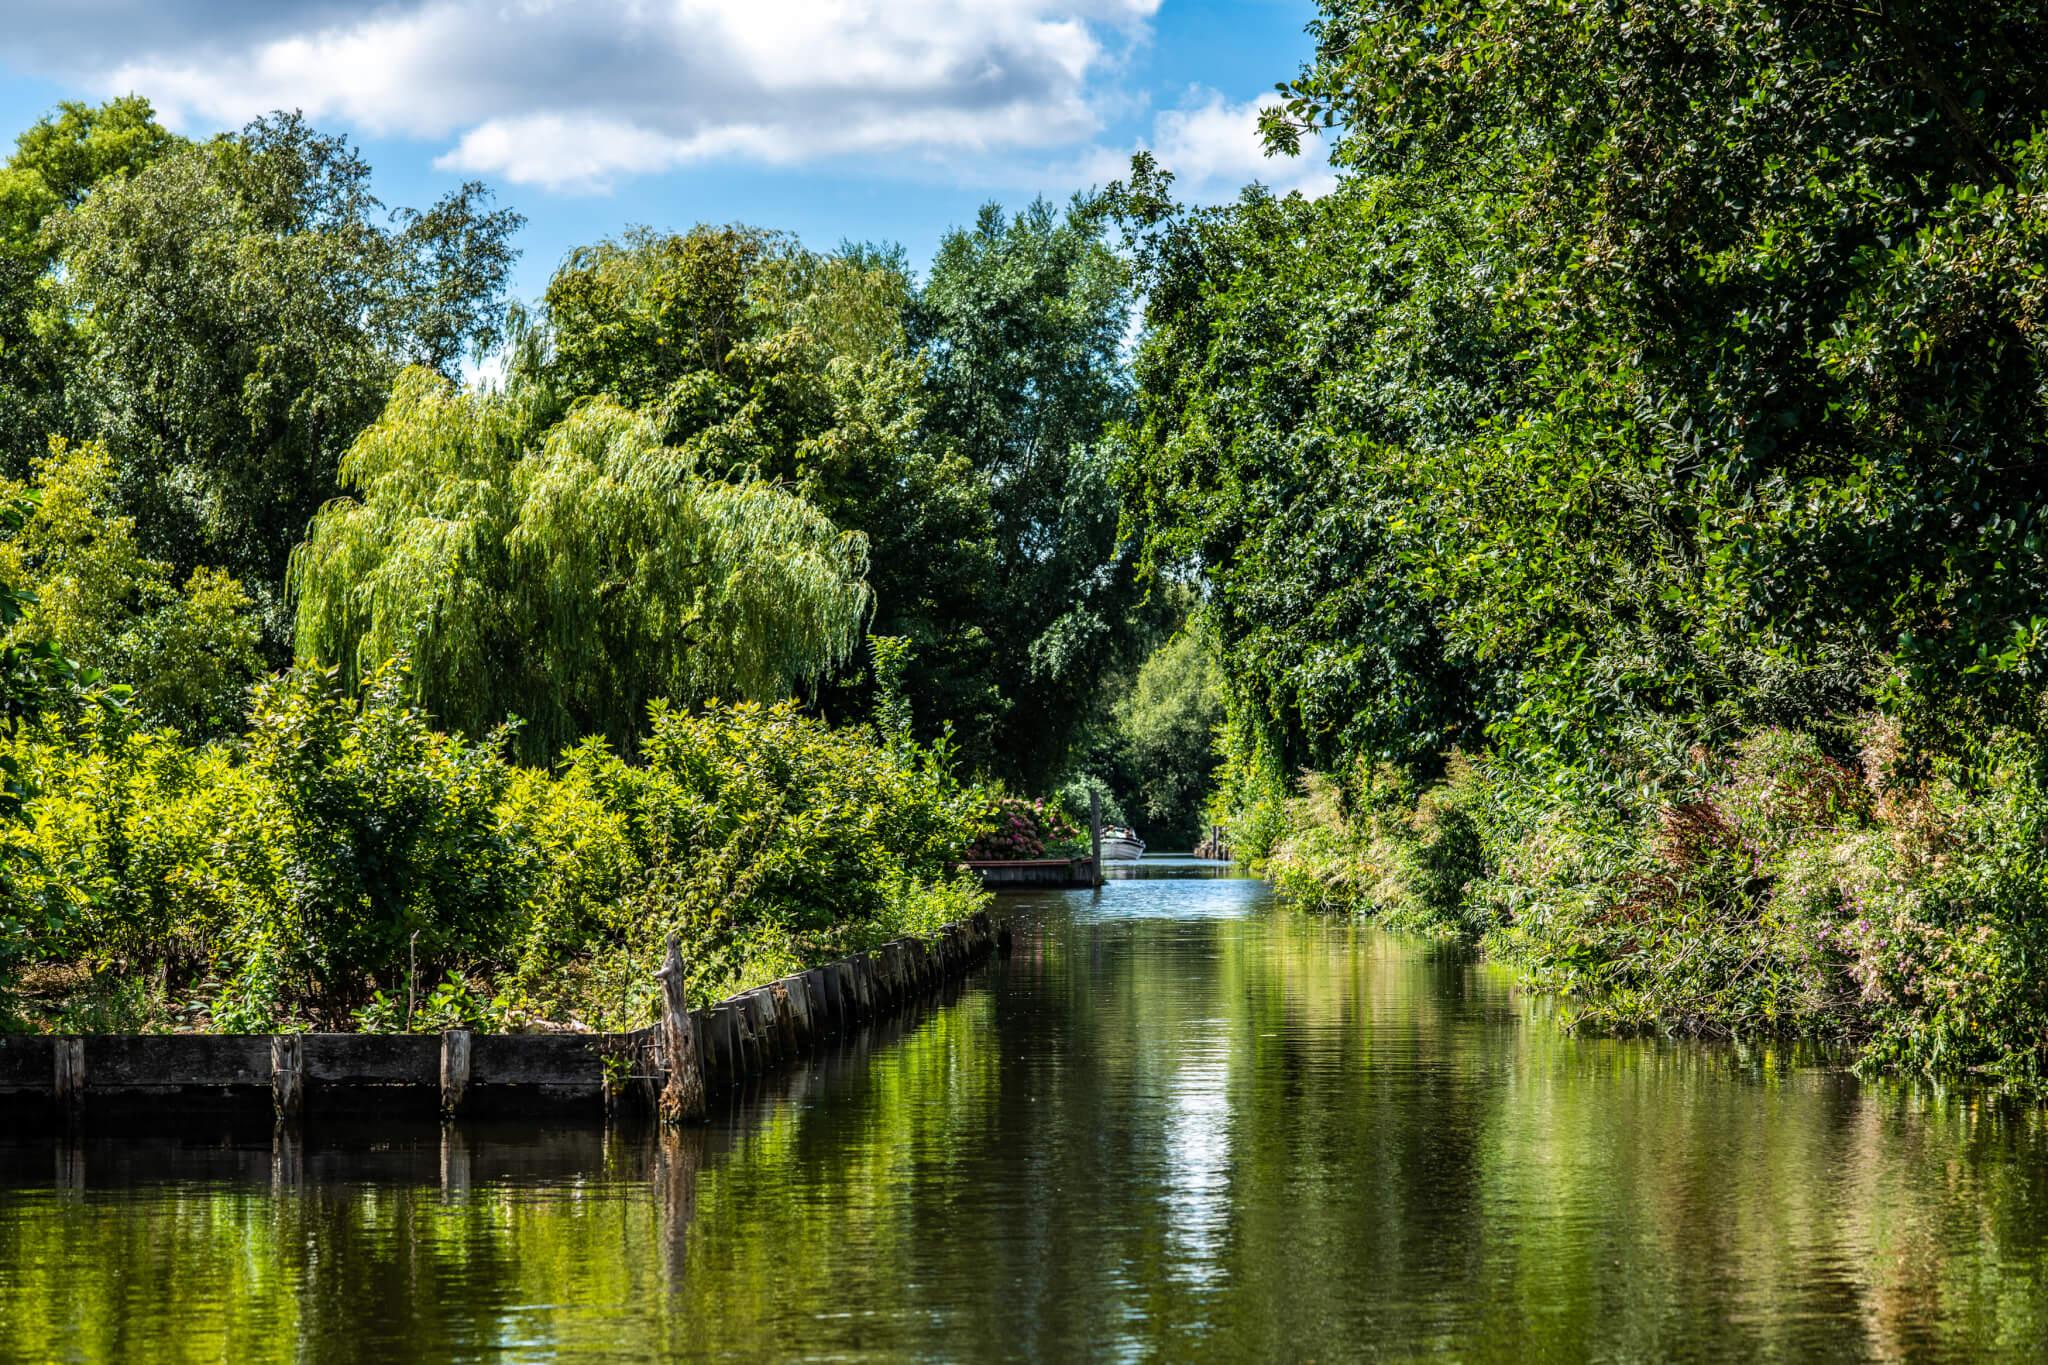 Aalsmeer Canal Cruise with Westeinder Rondvaart